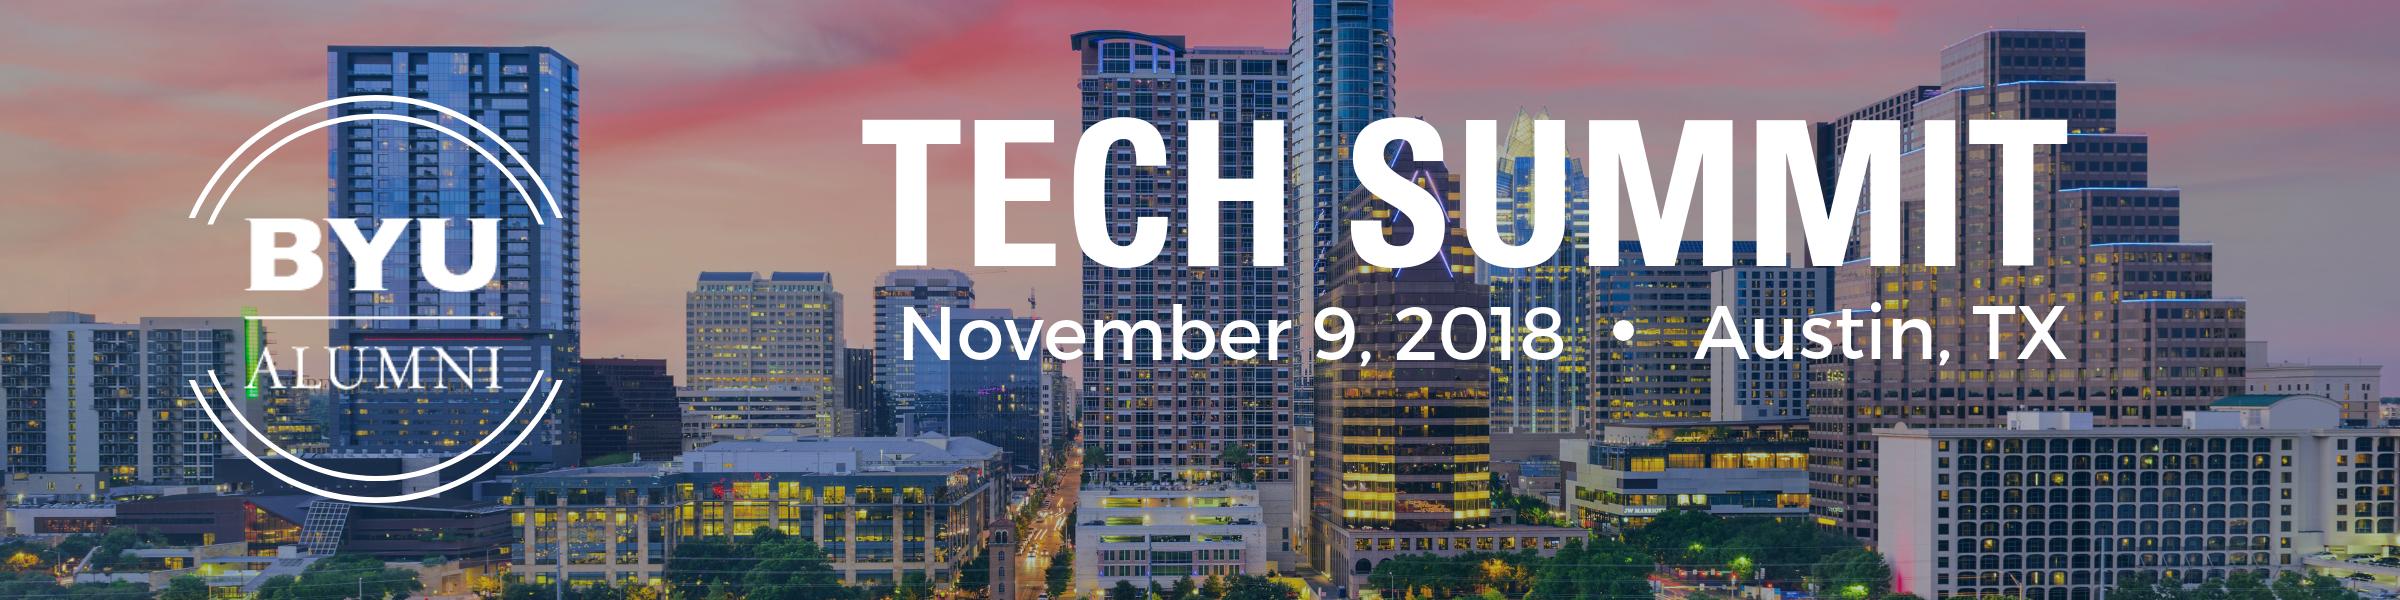 Austin Tech Summit3.png